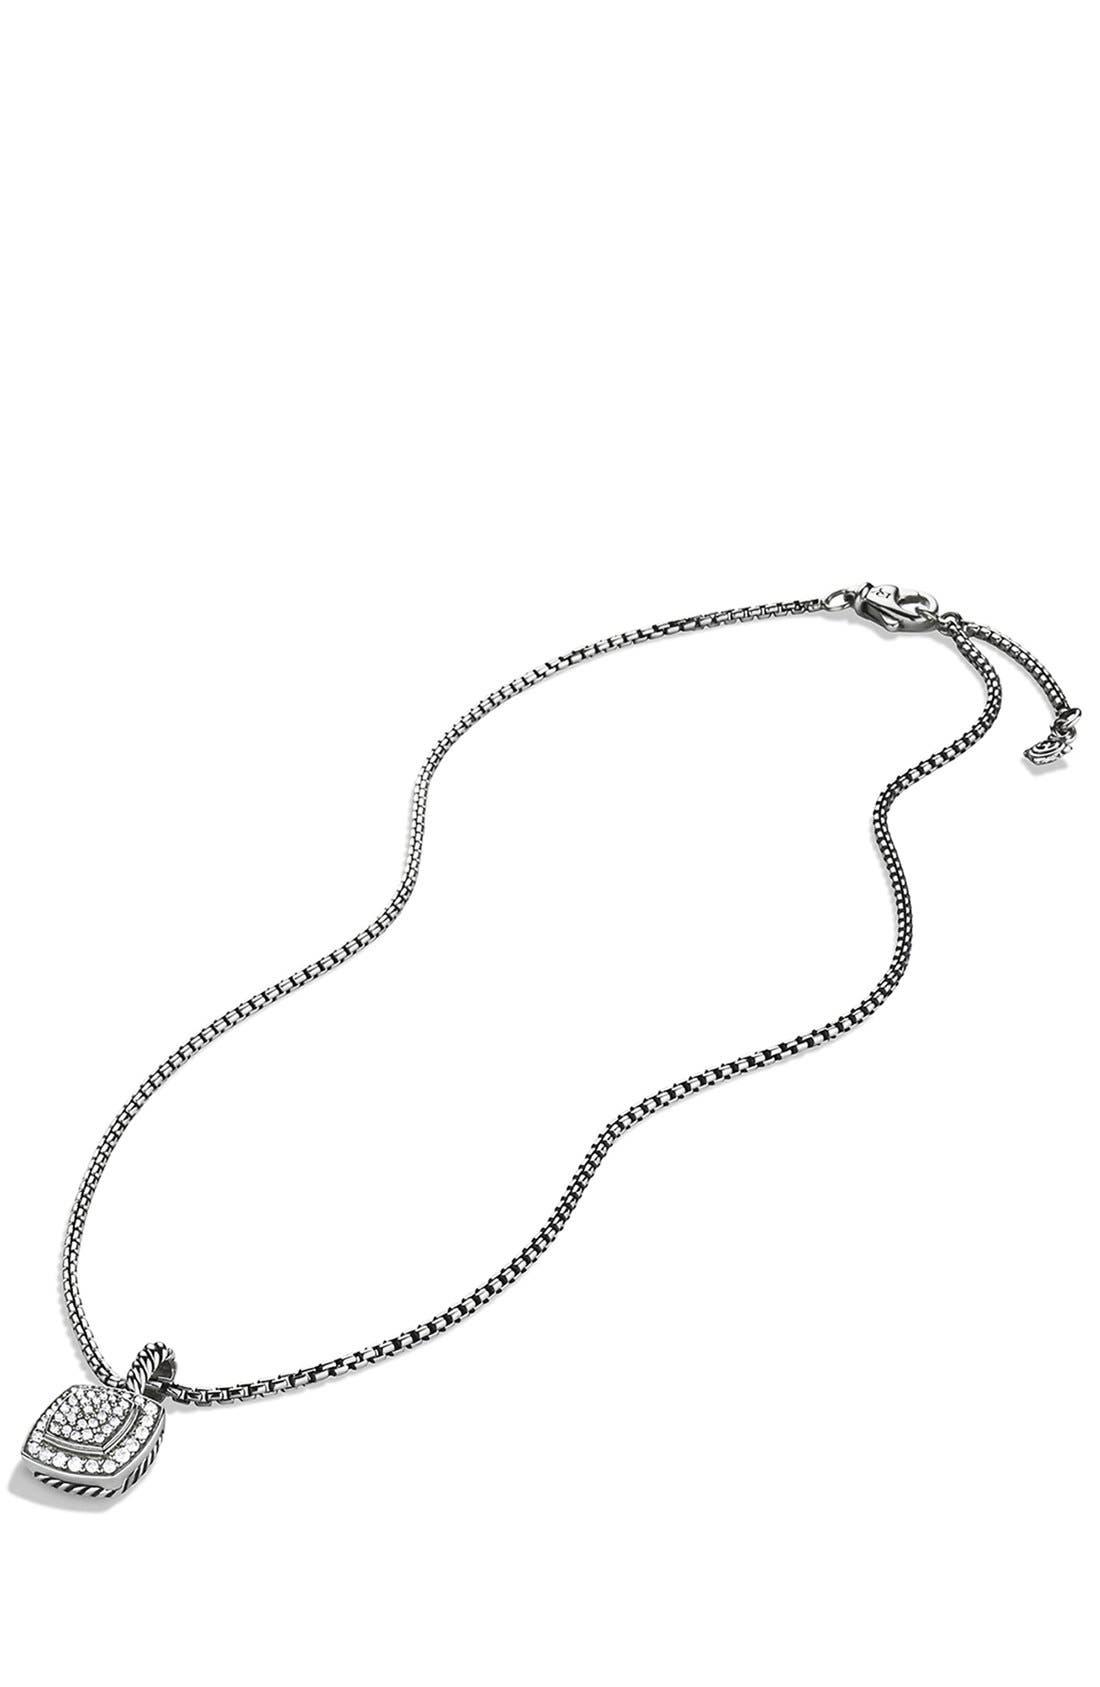 'Albion' Petite Pendant with Diamonds on Chain,                             Alternate thumbnail 4, color,                             DIAMOND